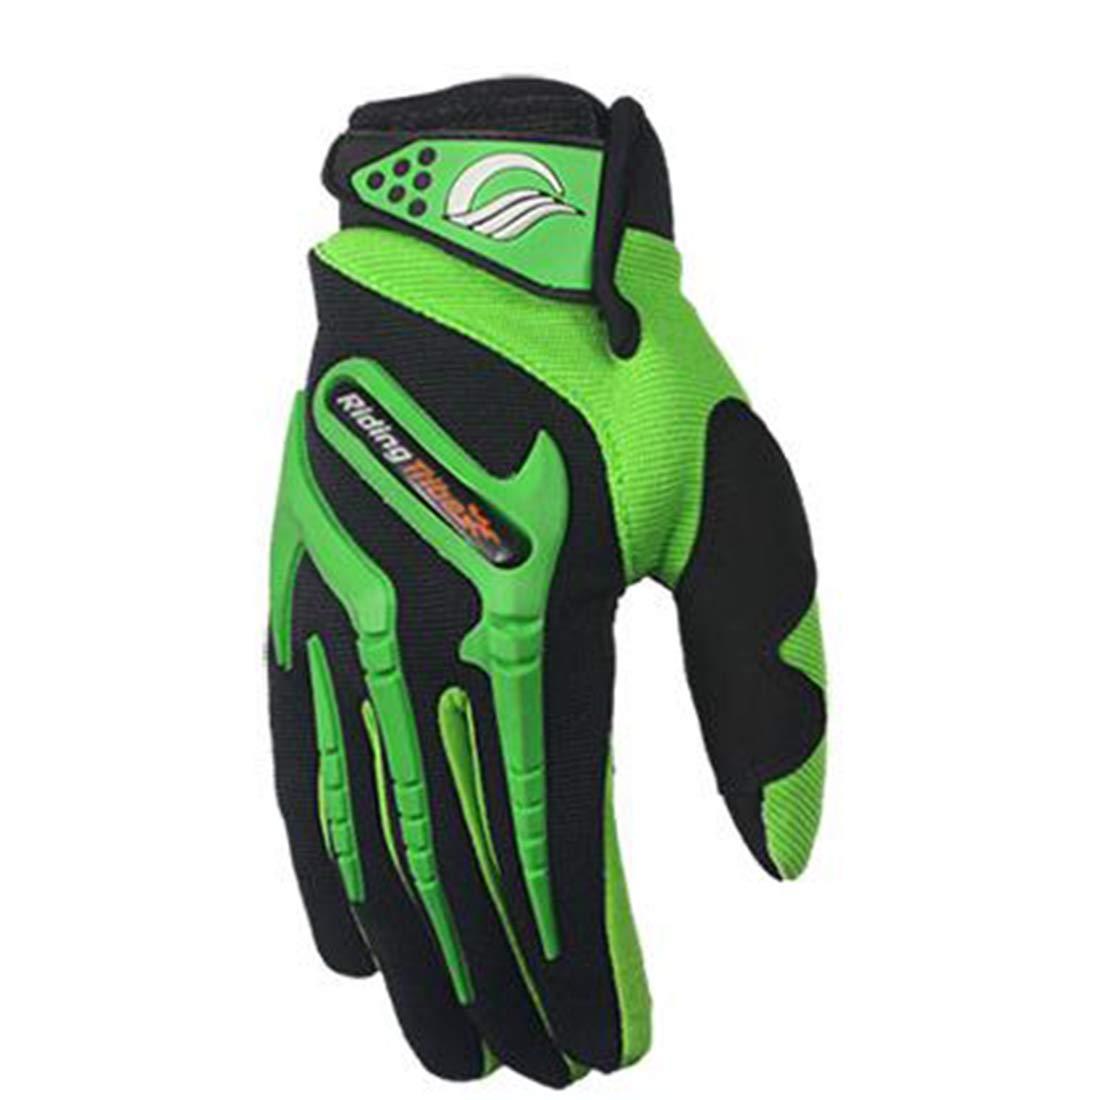 JESSIEKERVIN YY3 Vollfinger-Fahrradhandschuhe für das Motorradklettern Wandern Jagd Outdoor Sports Gear Handschuhe